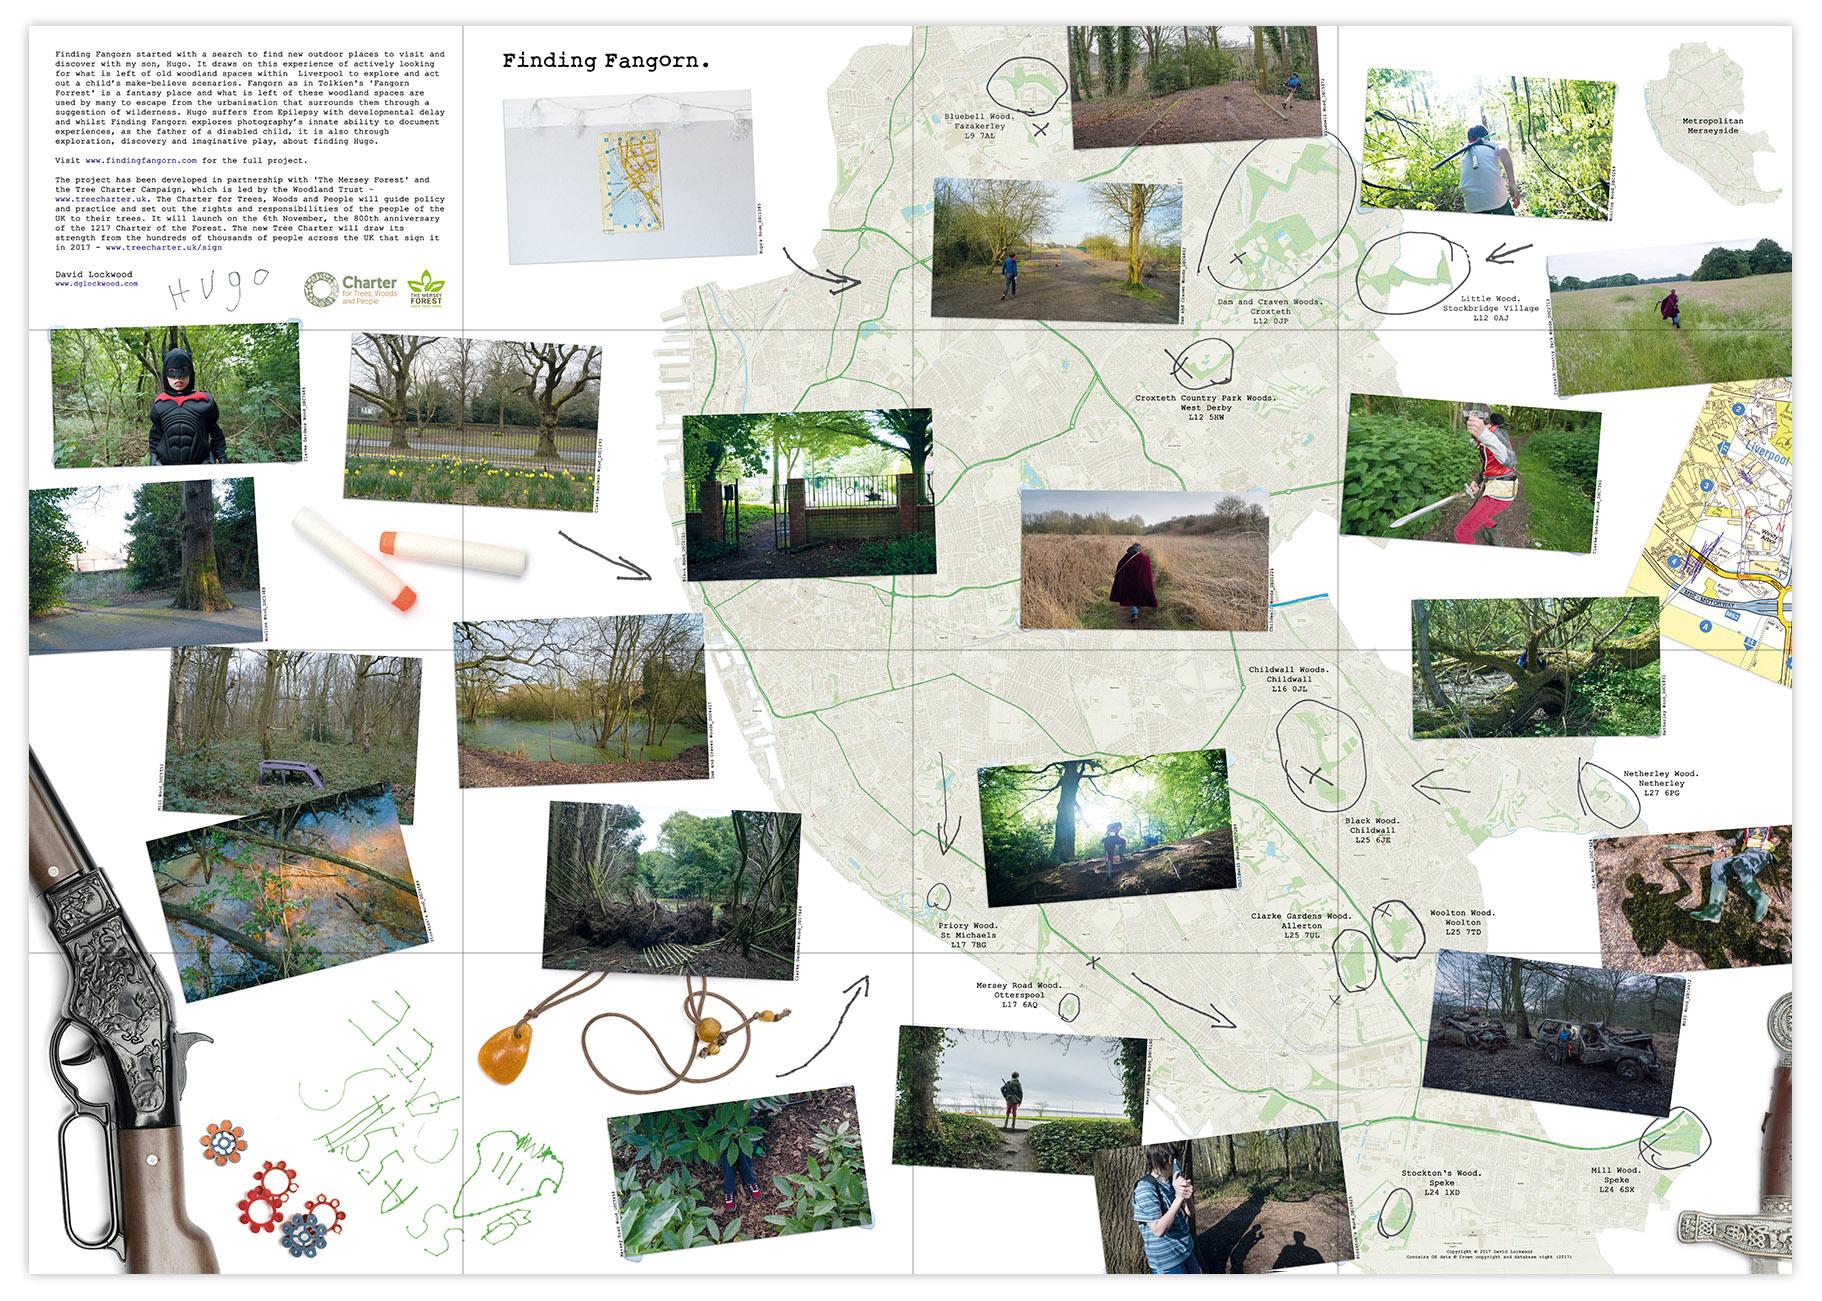 Finding Fangorn Folded Map Image